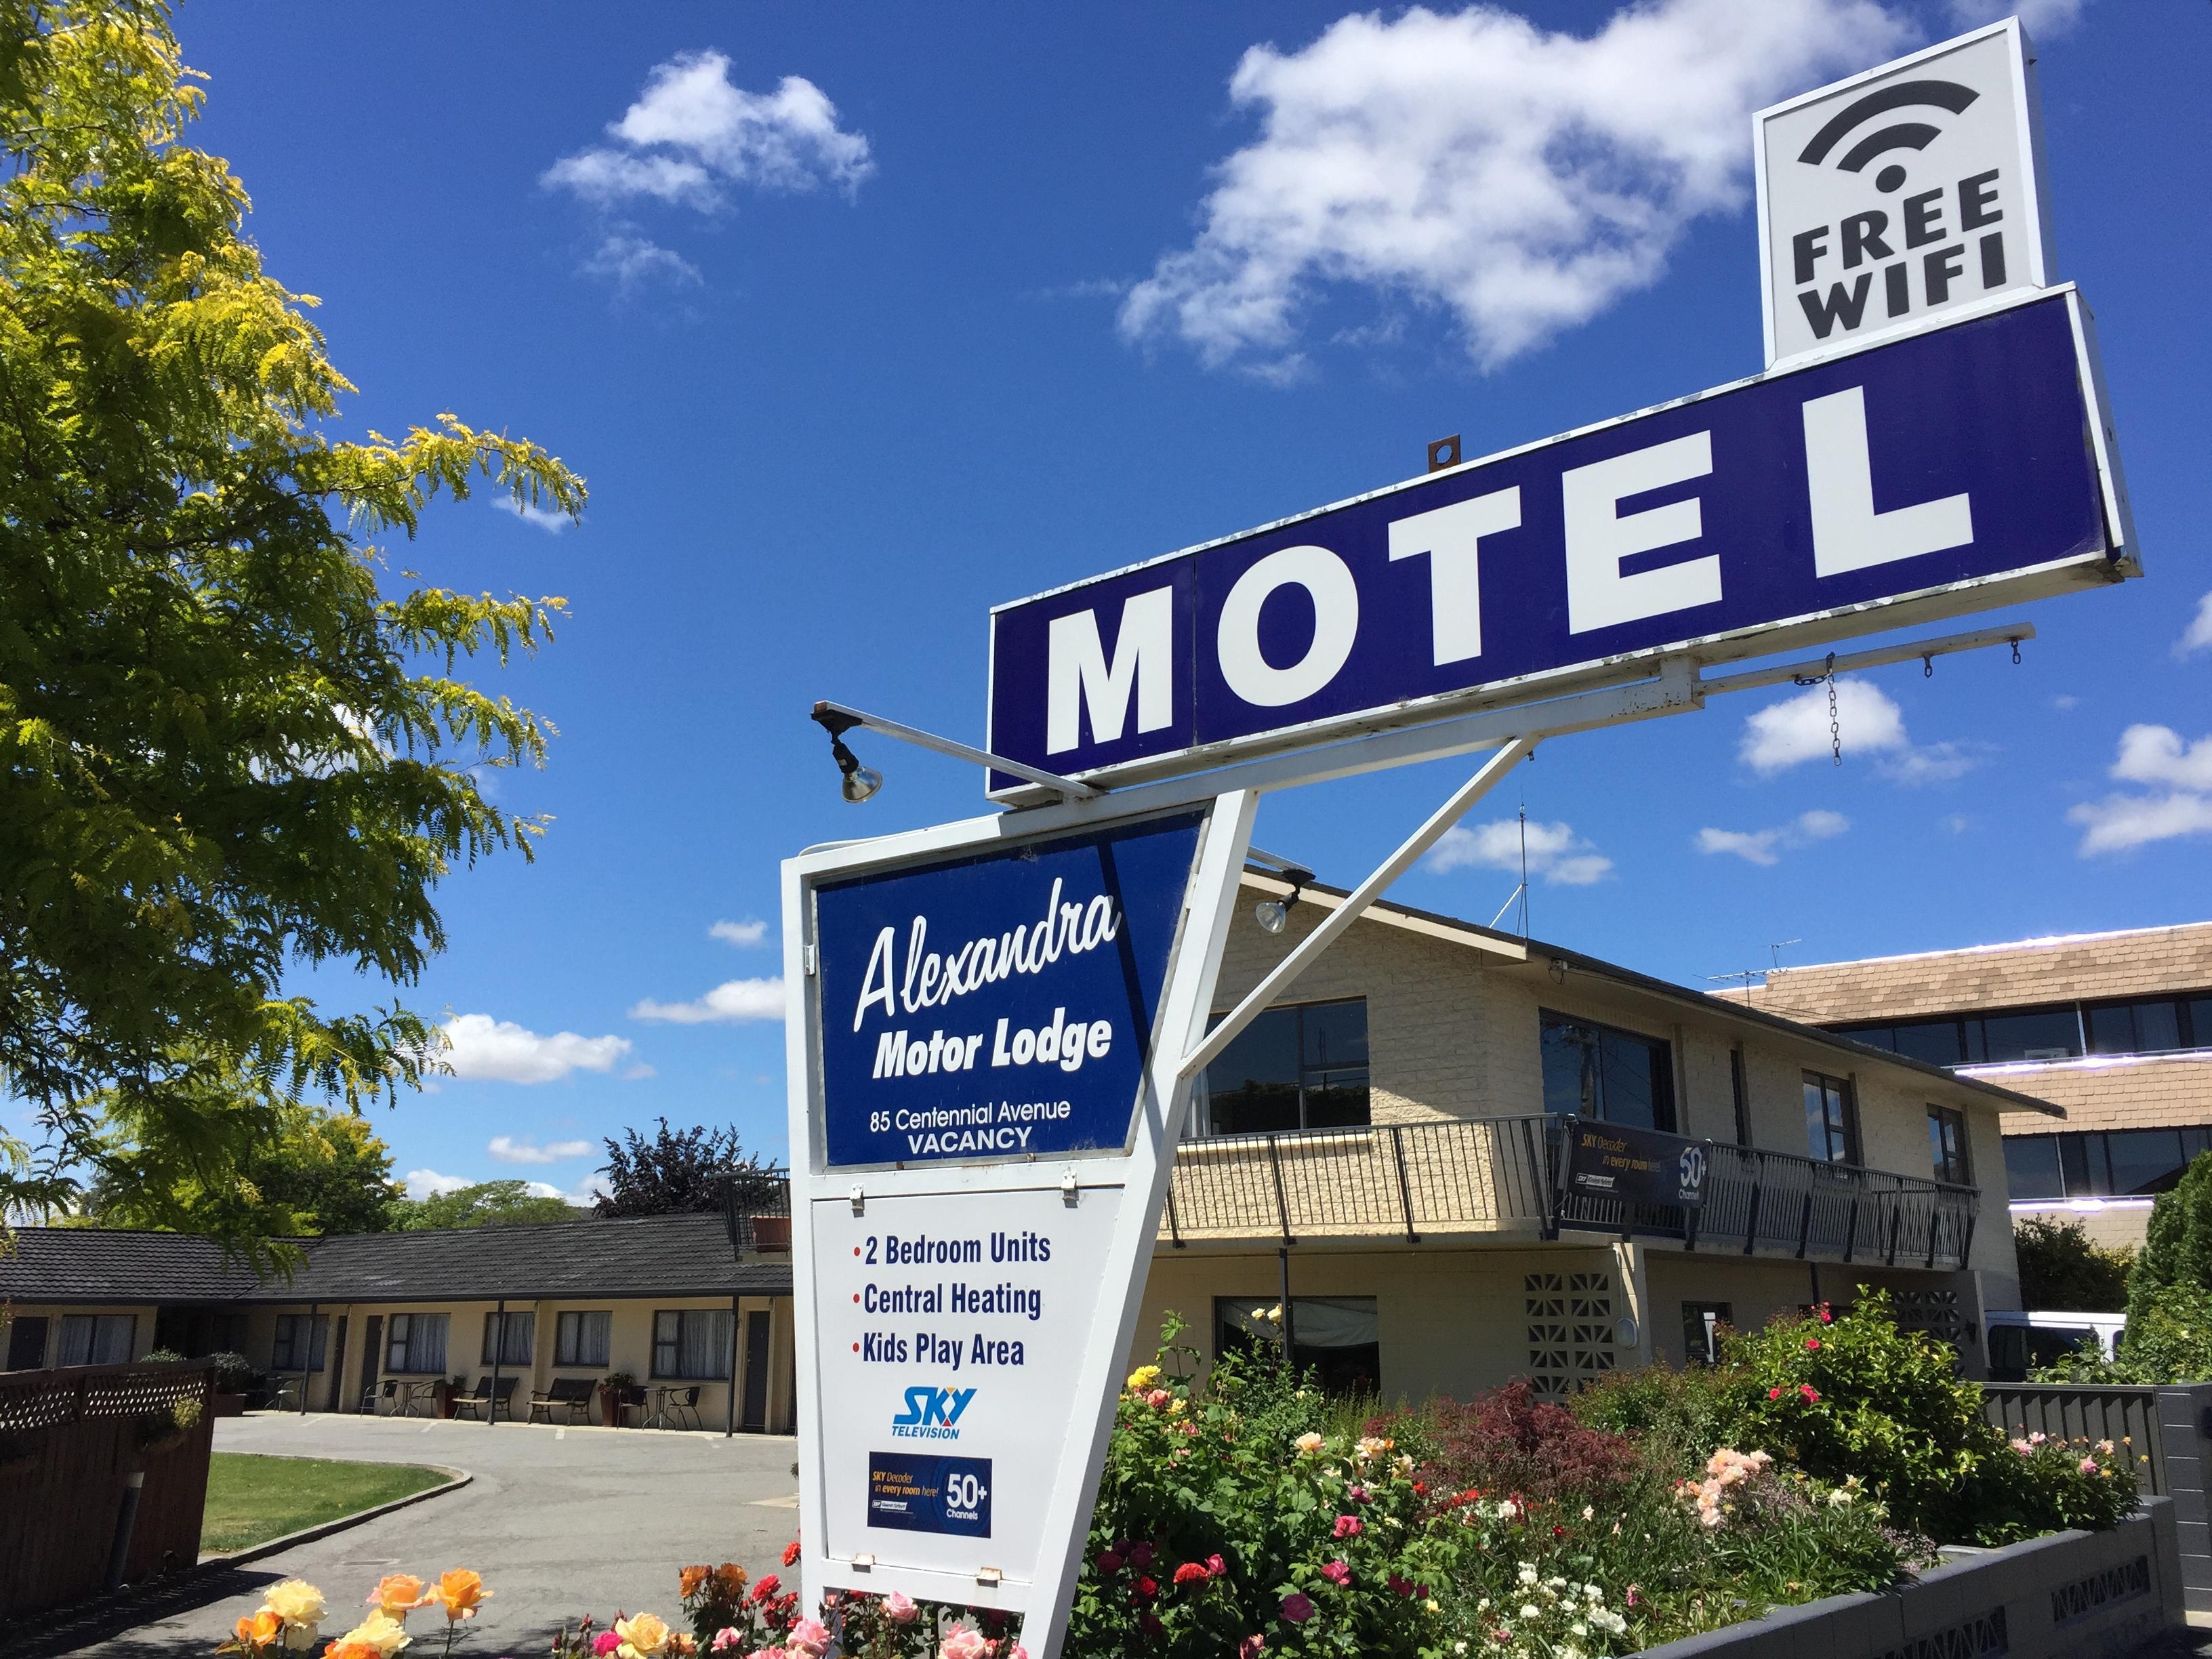 Alexandra Motor Lodge